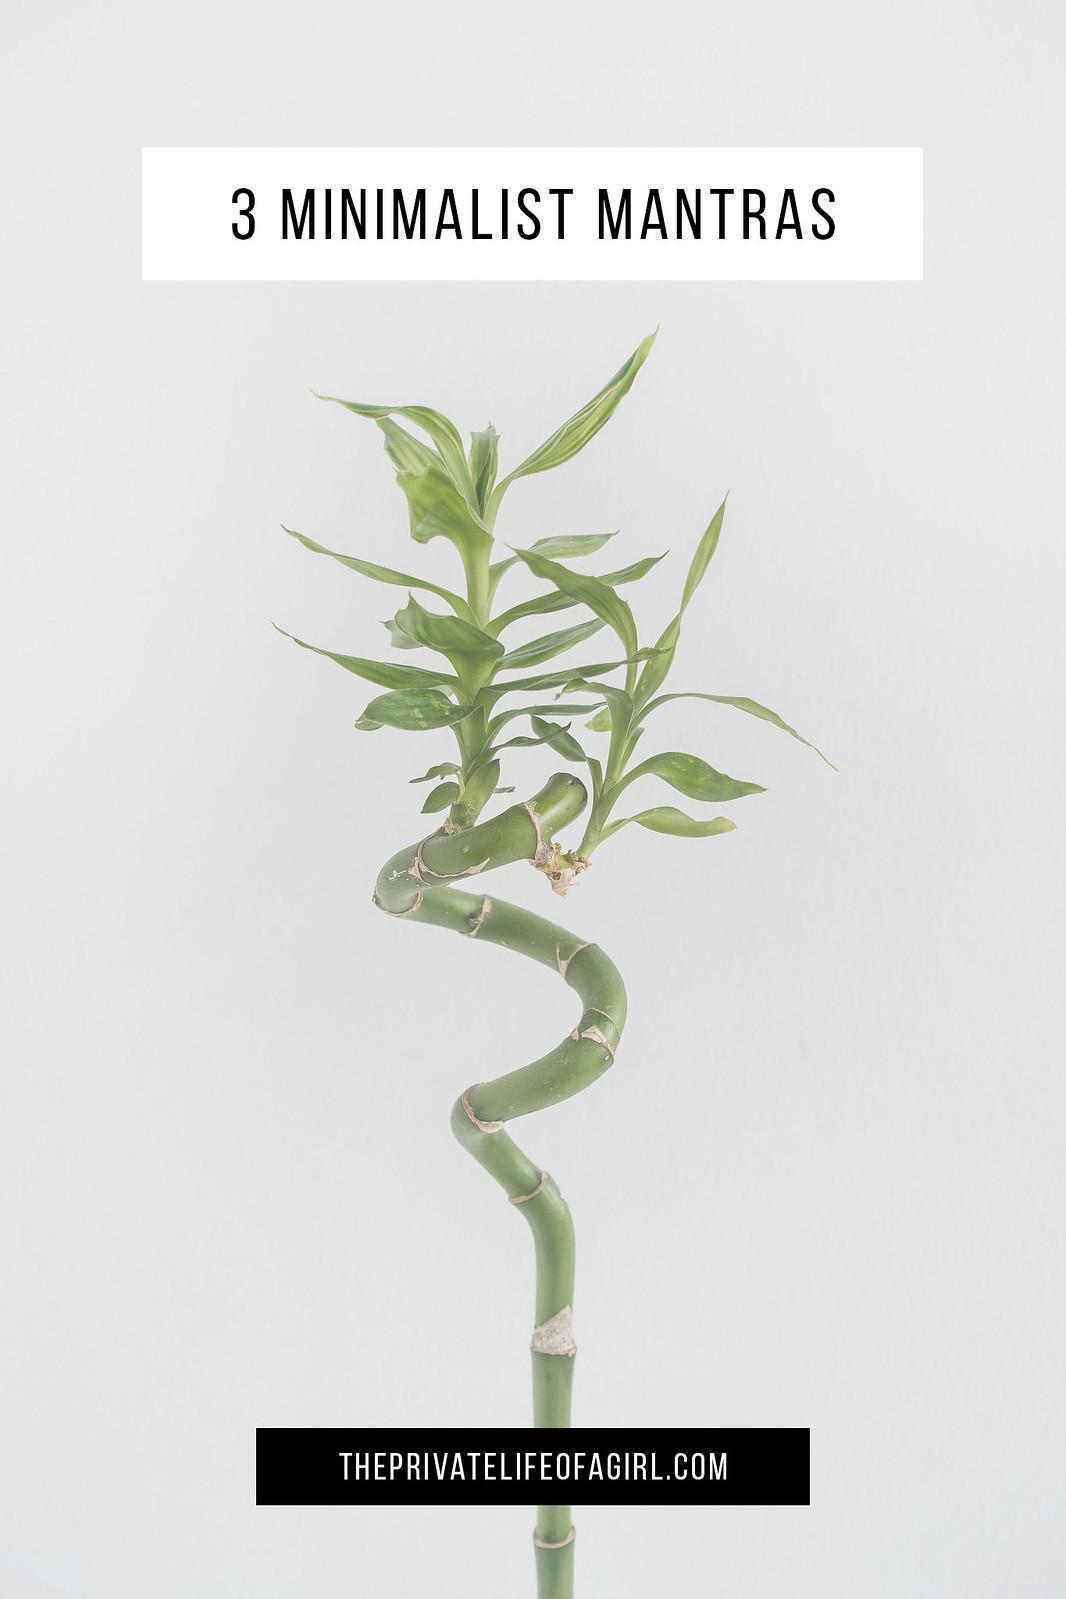 Minimalist Mantras